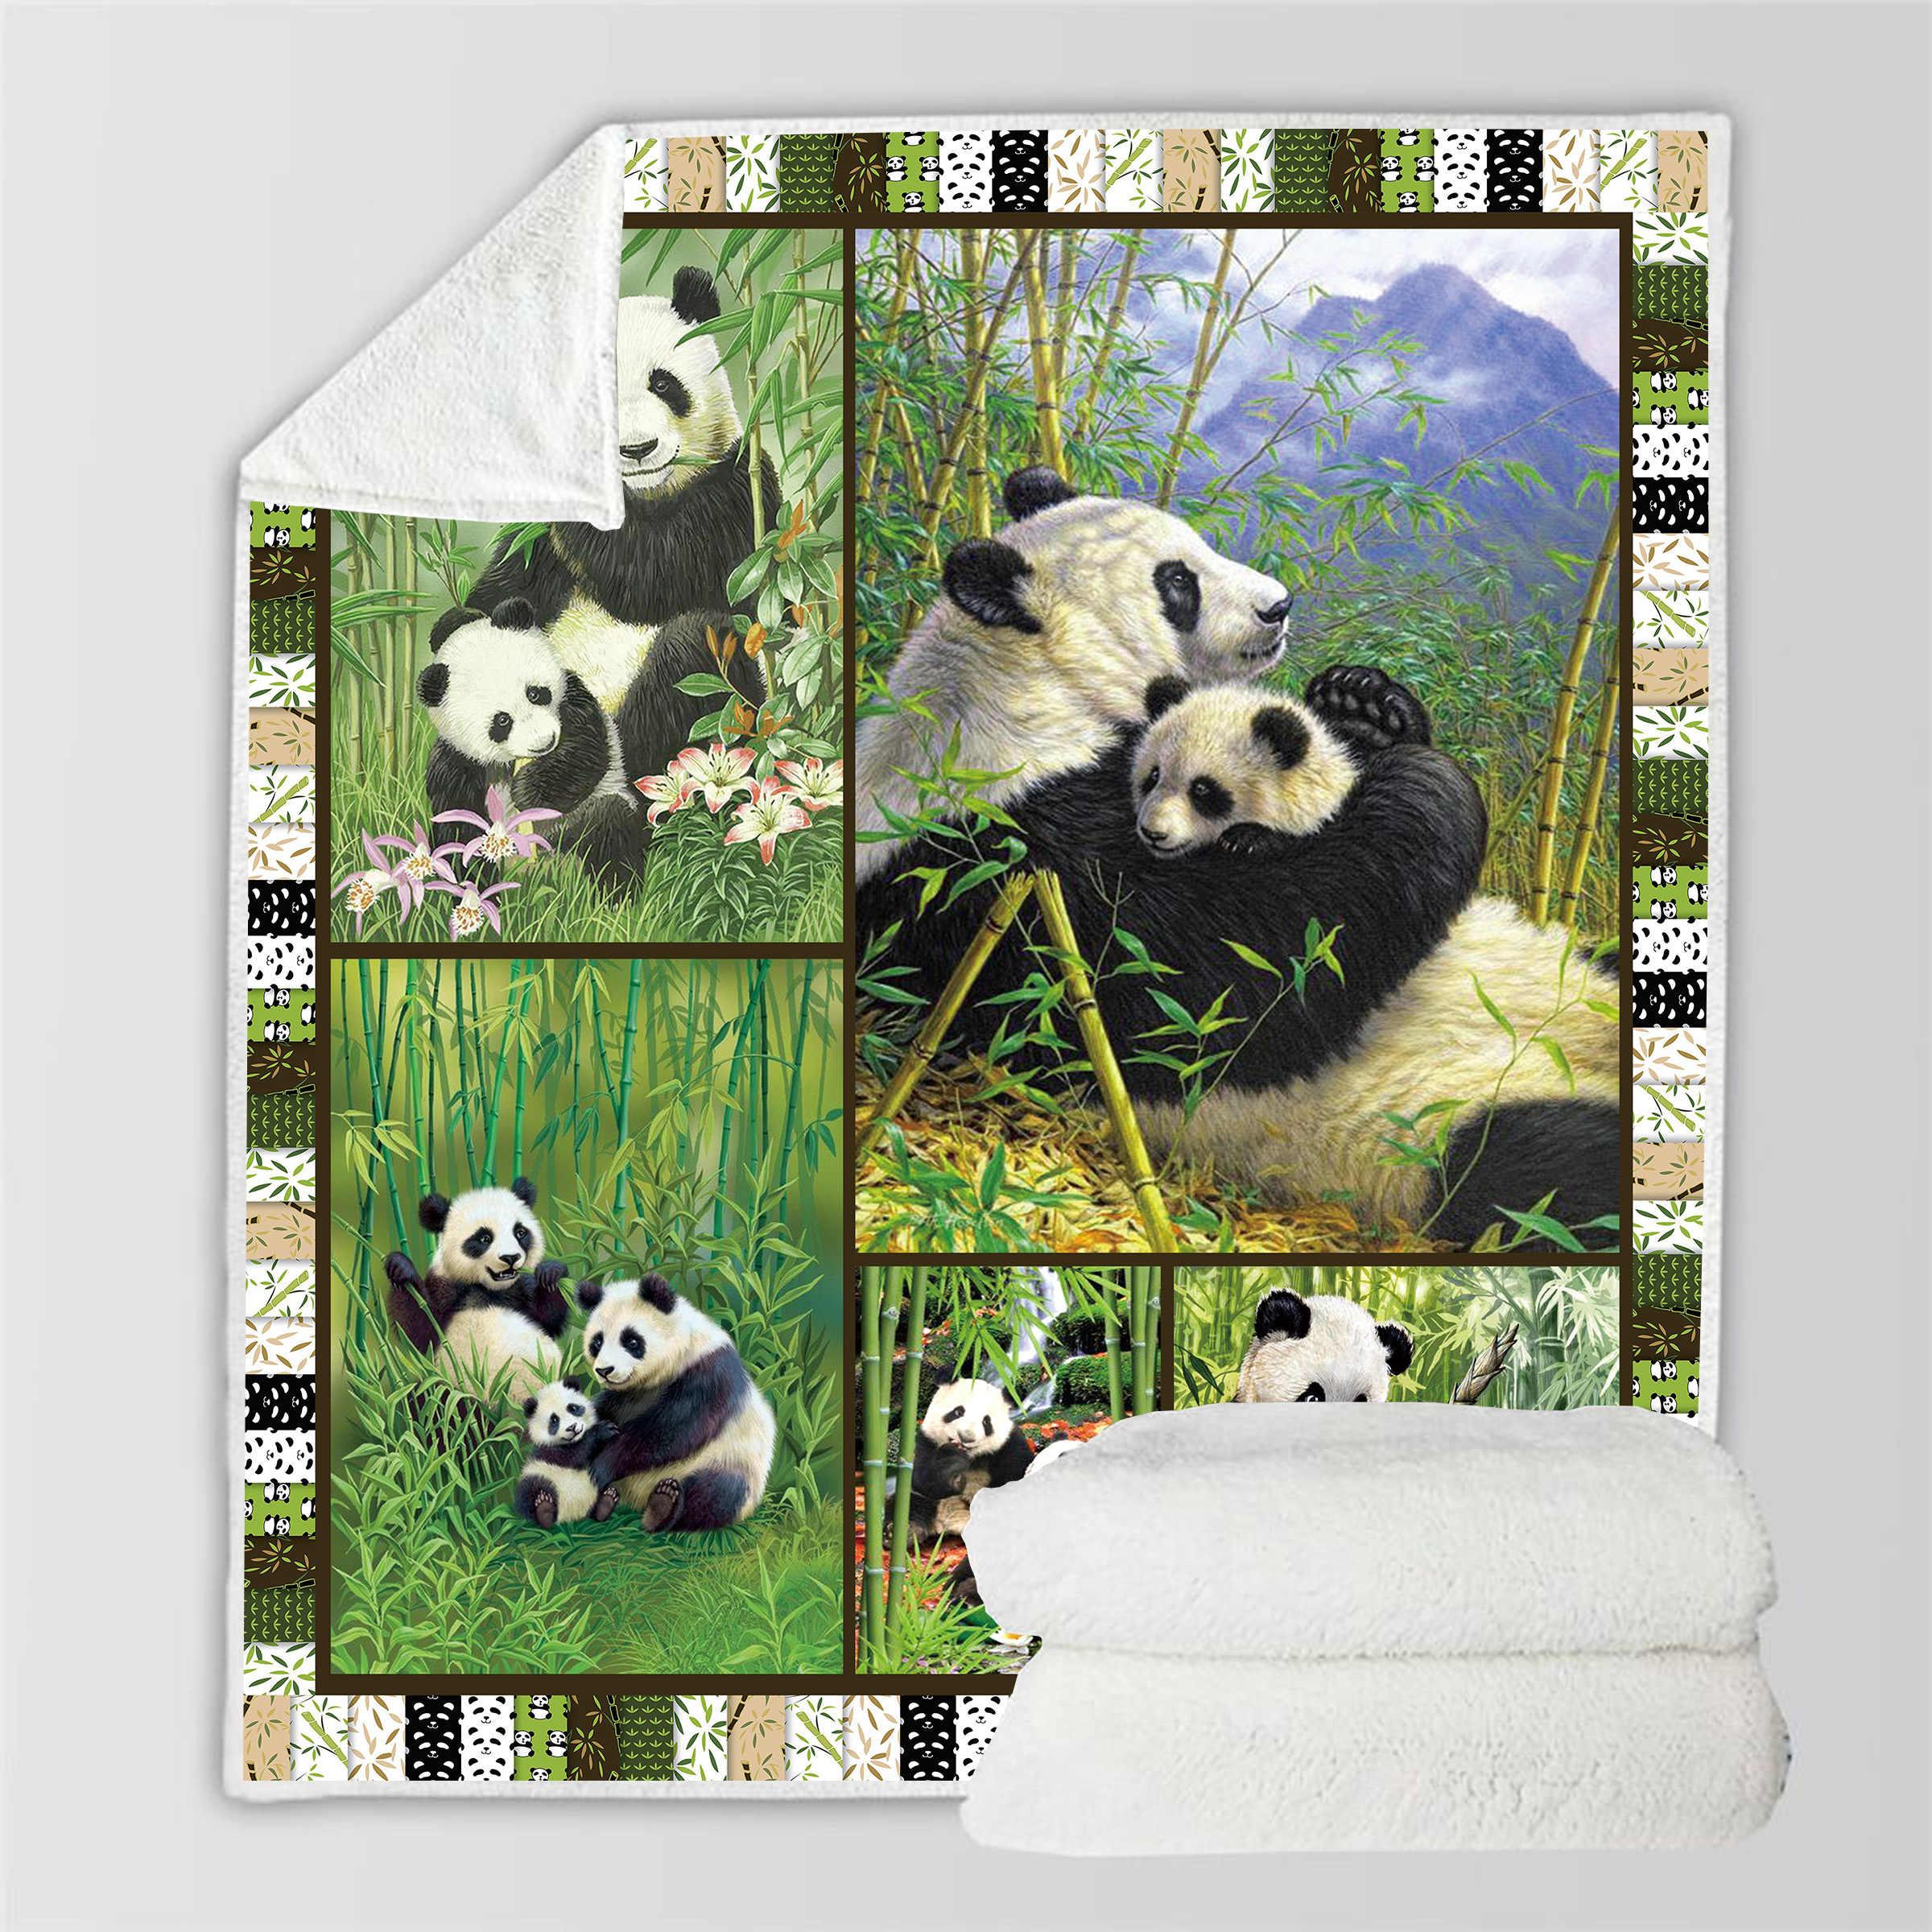 3D Panda Sherpa Blanket Back to School Scotland Pattern Custom Bed Sofa Printed Fleece Plush Throw Blanket Bedspread Blanket